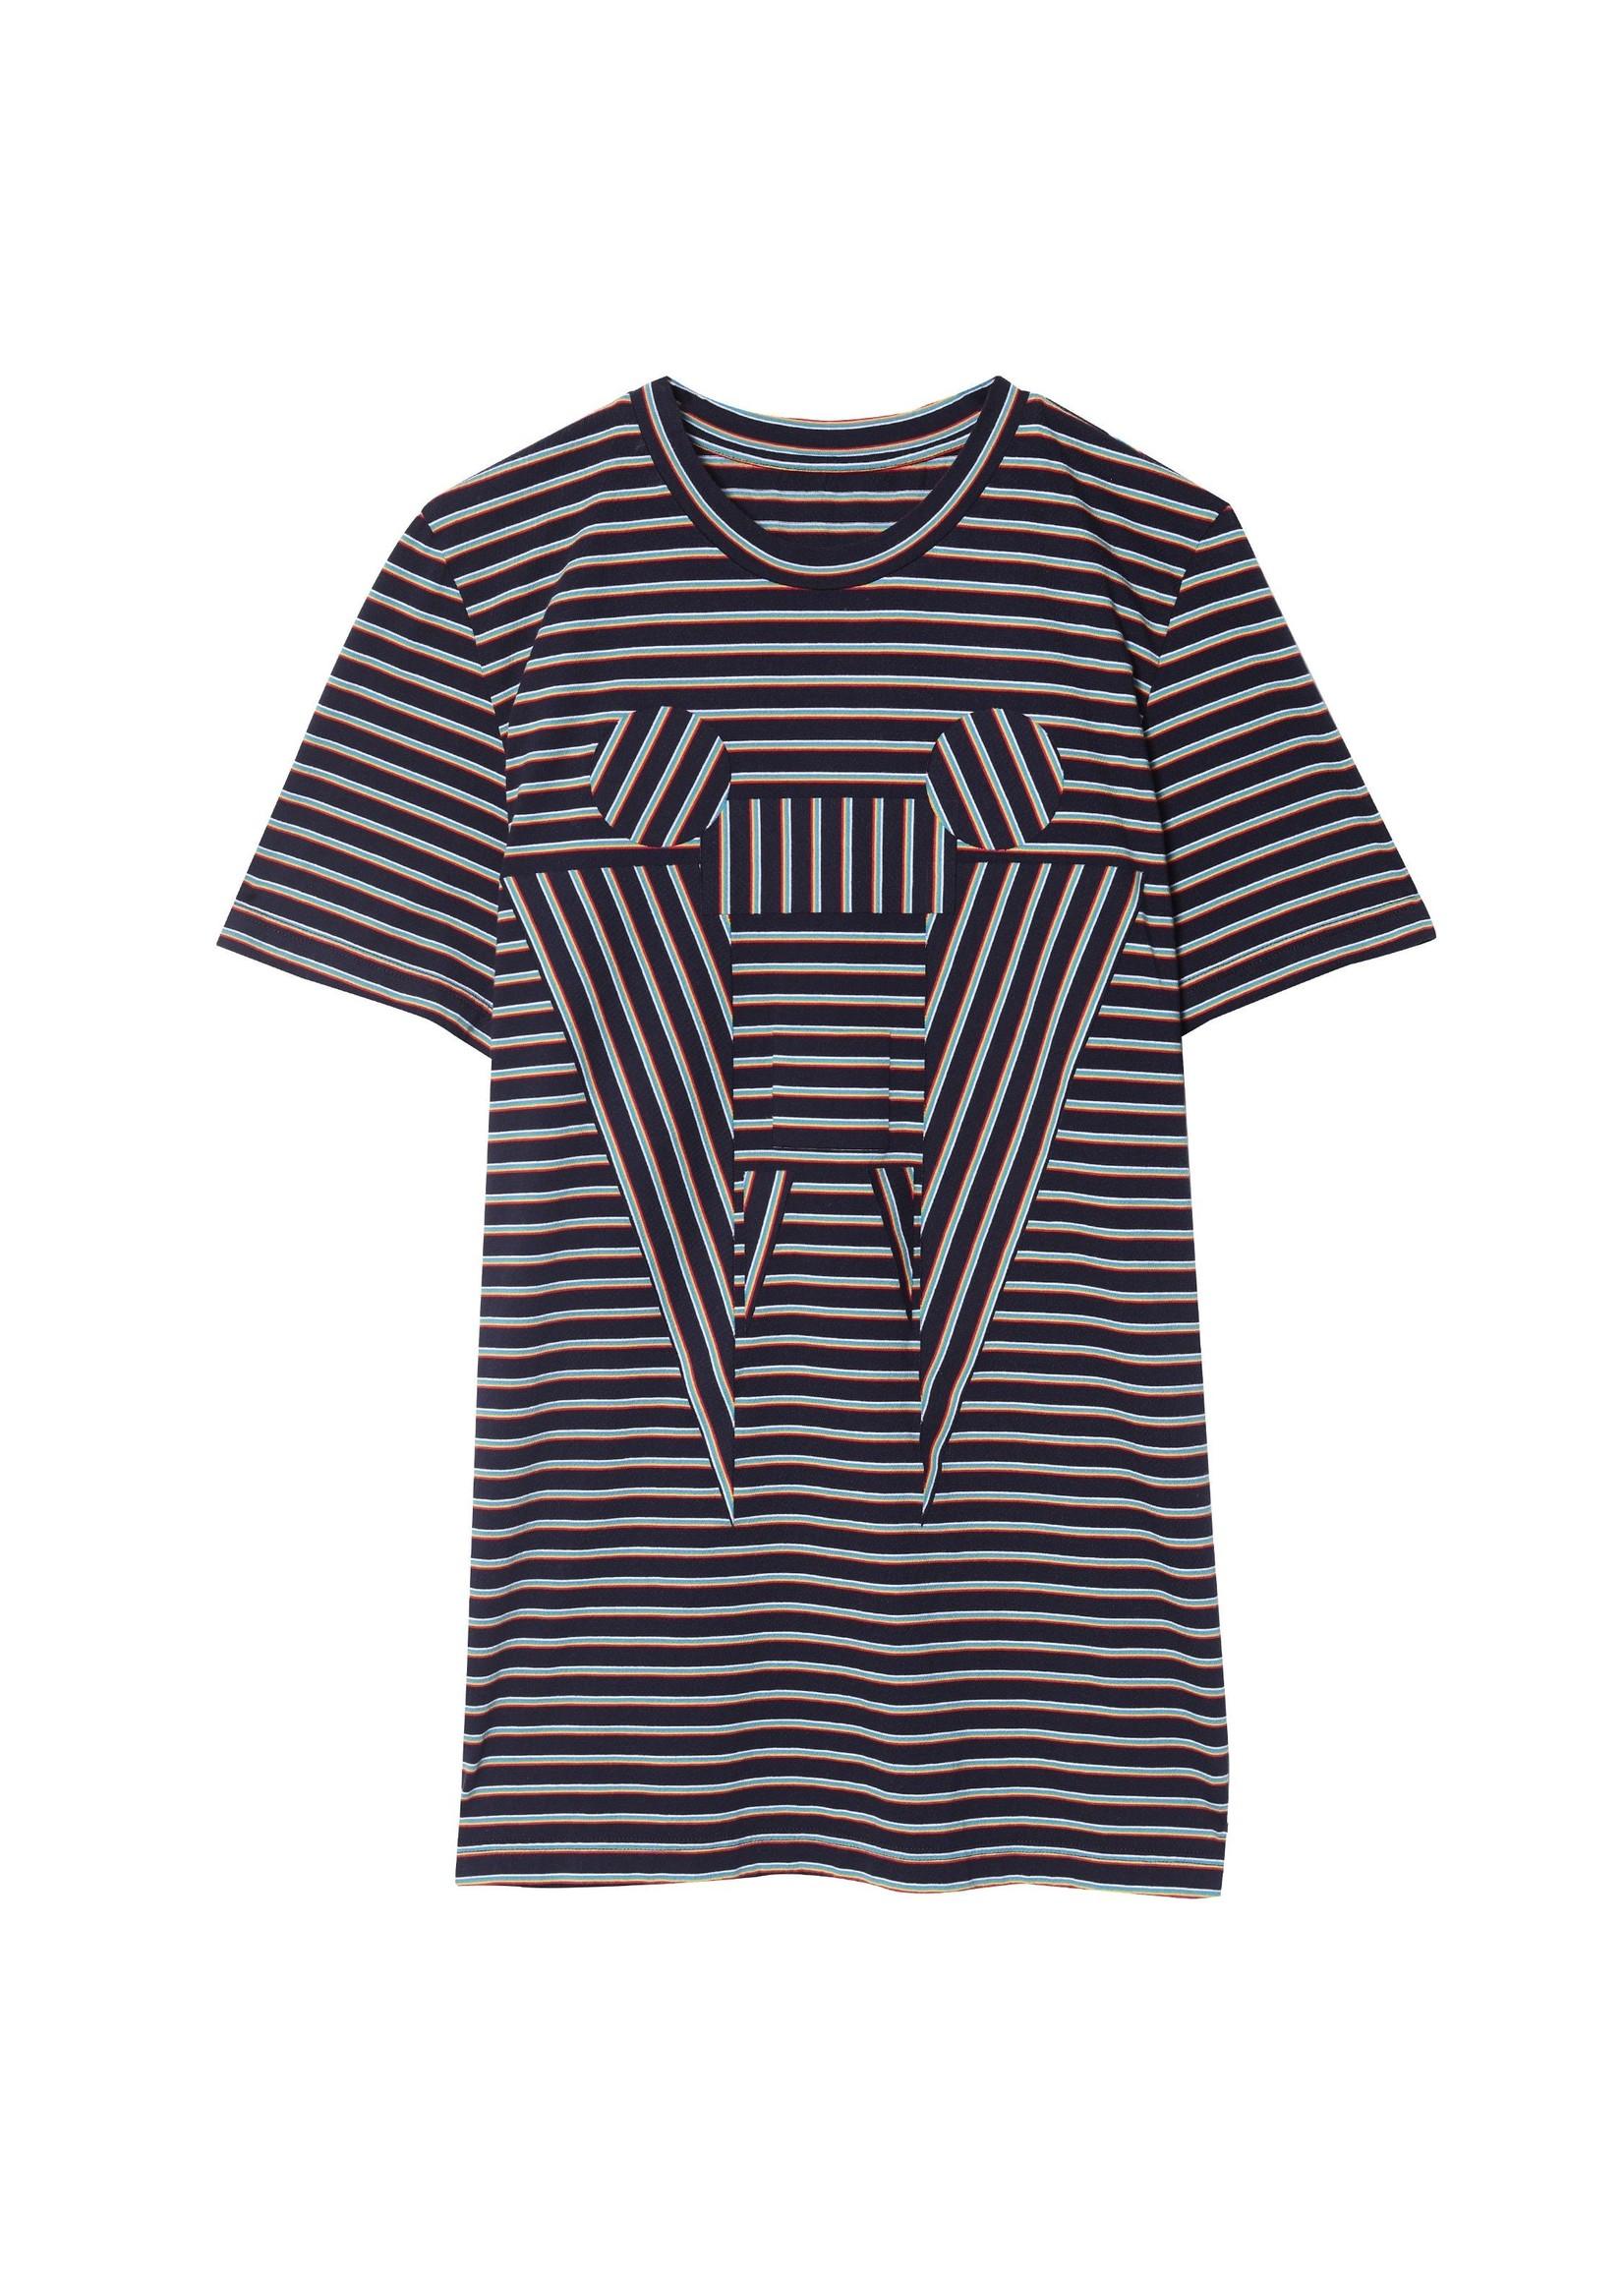 JNBY 5k4612000  t shirt